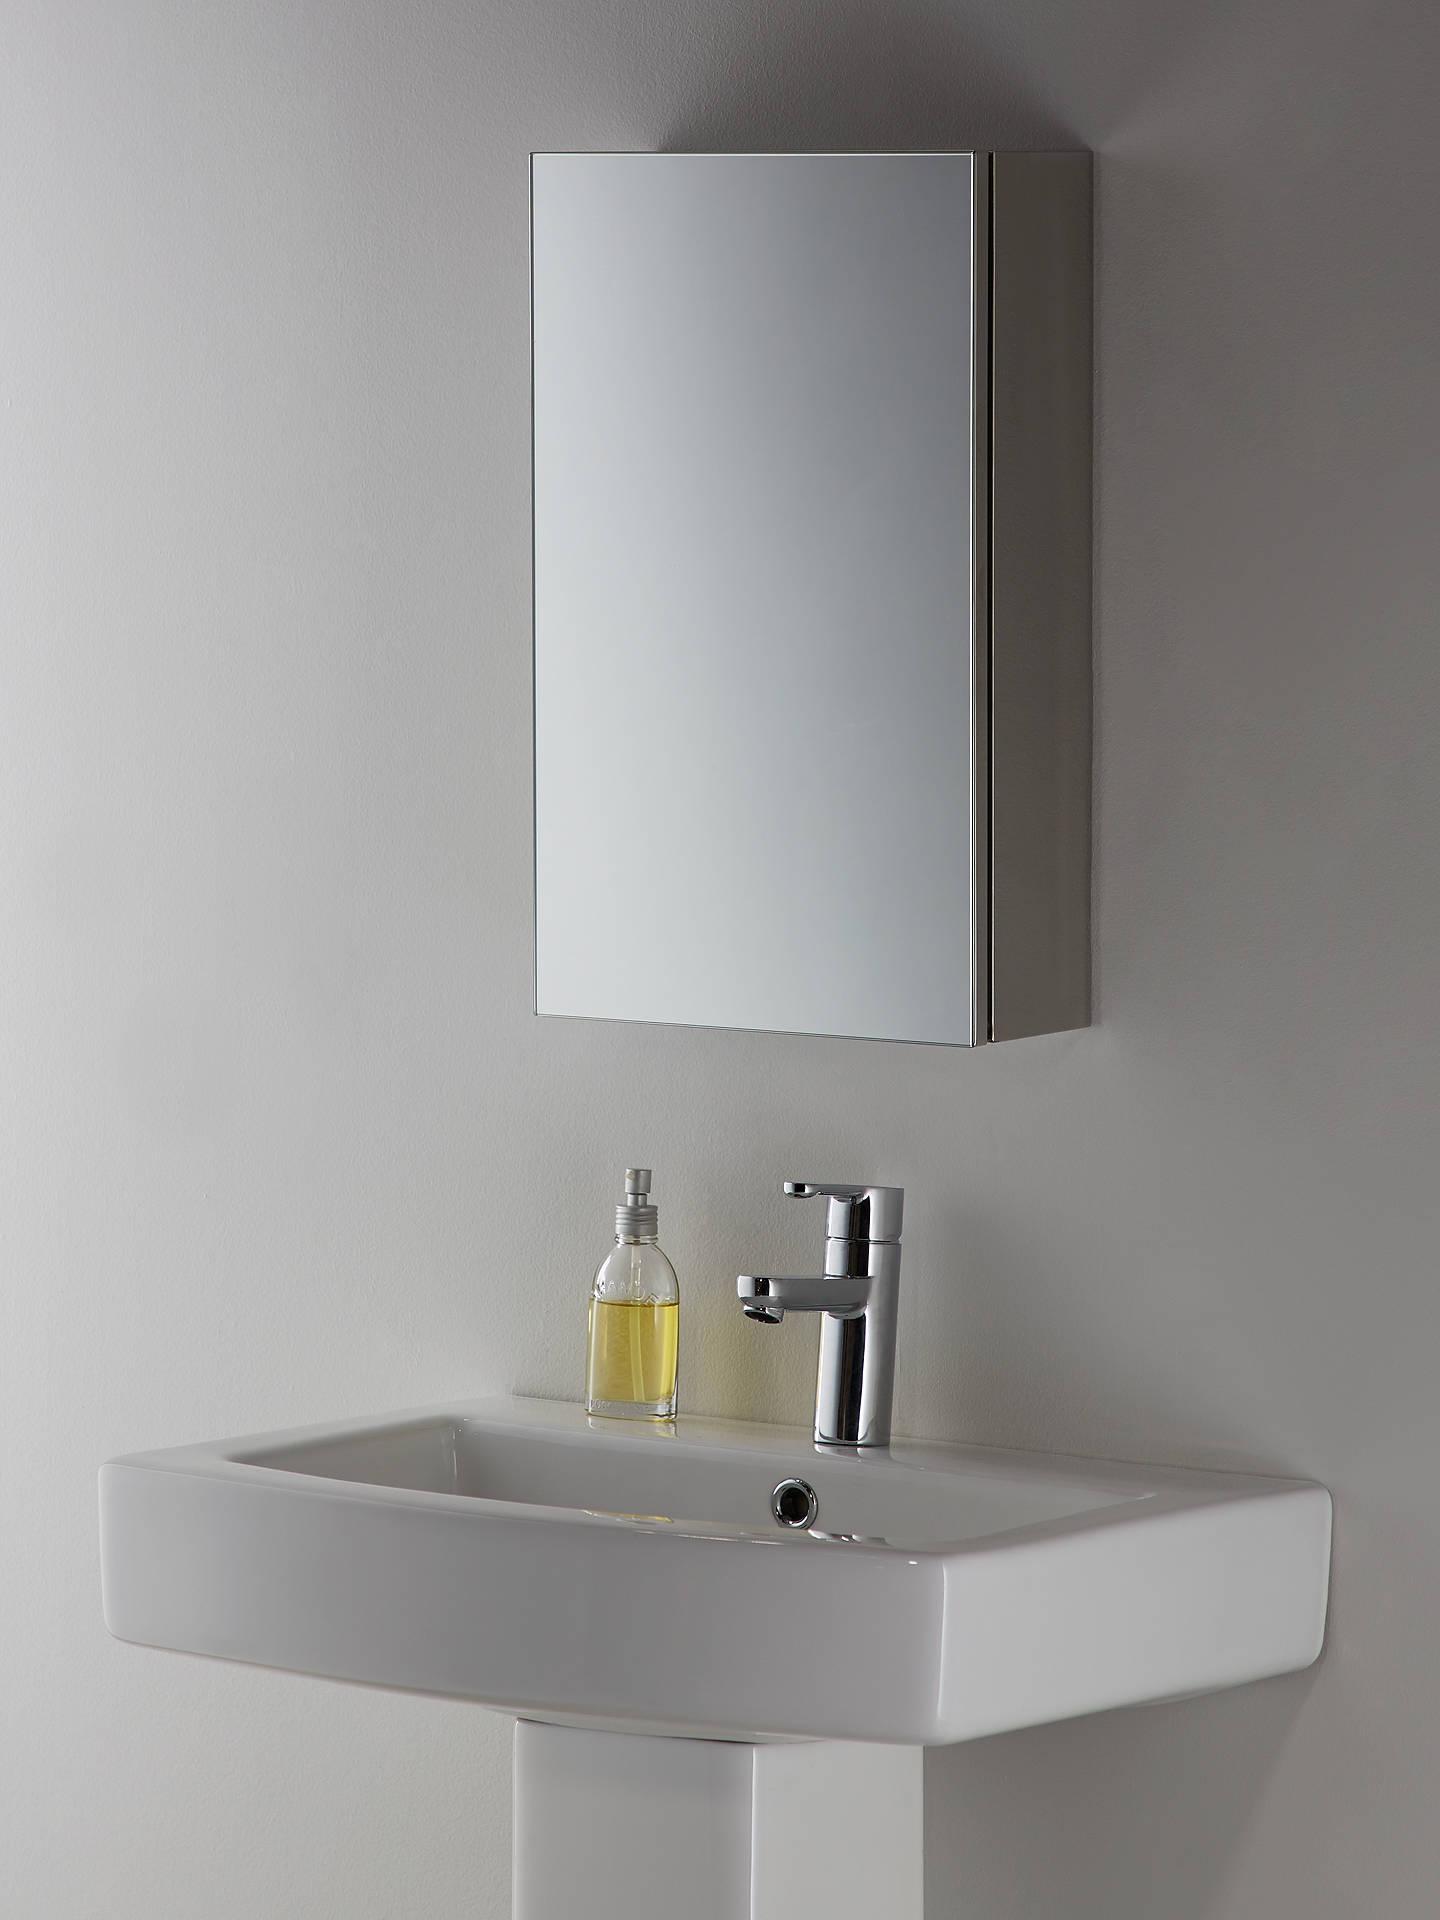 Fine John Lewis Partners Small Single Mirrored Bathroom Cabinet Interior Design Ideas Gentotryabchikinfo